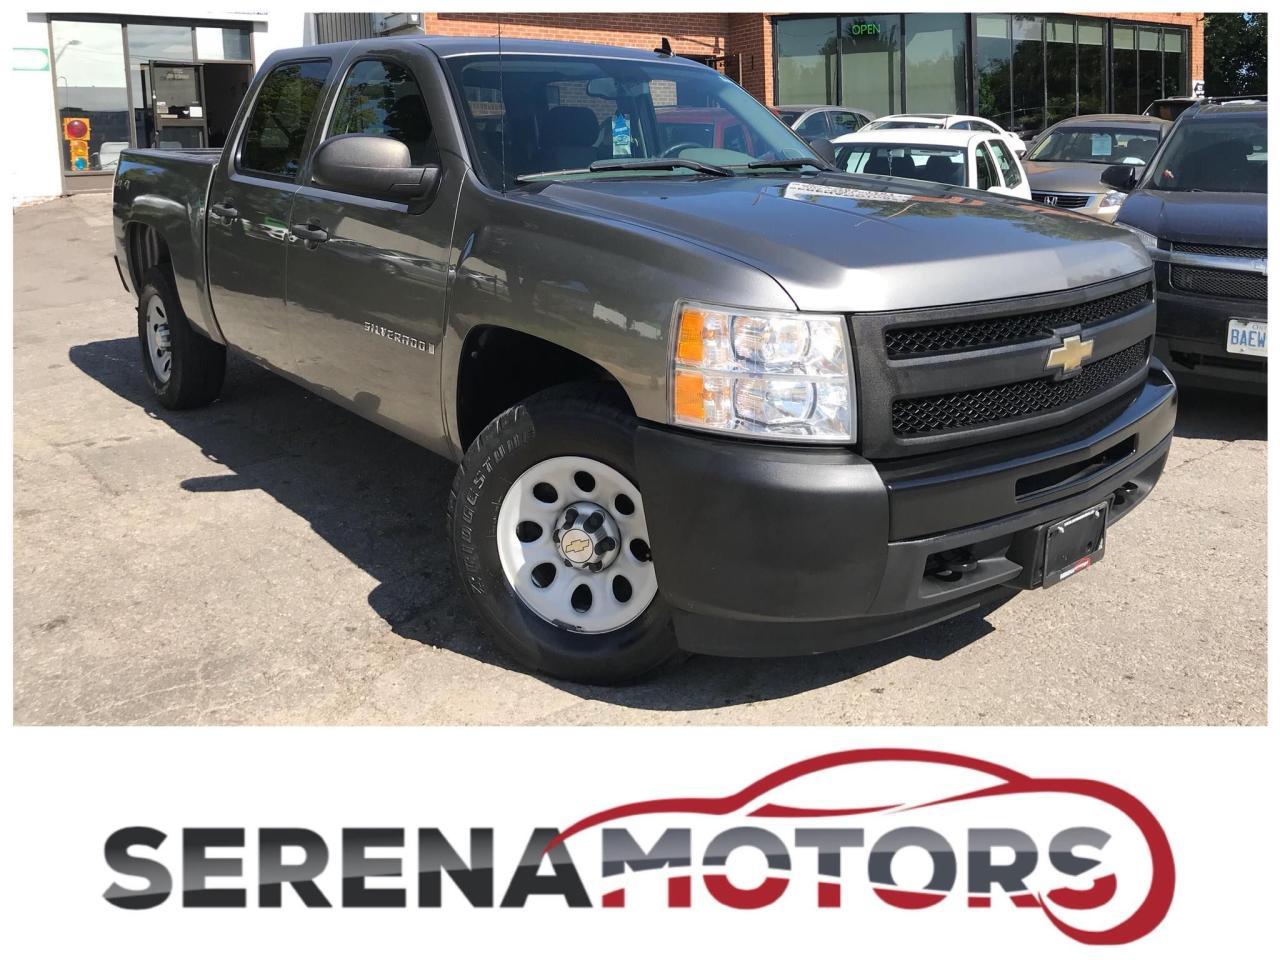 2009 Chevrolet Silverado 1500 WT | 4X4 | CREW CAB | 6 PASSENGERS |